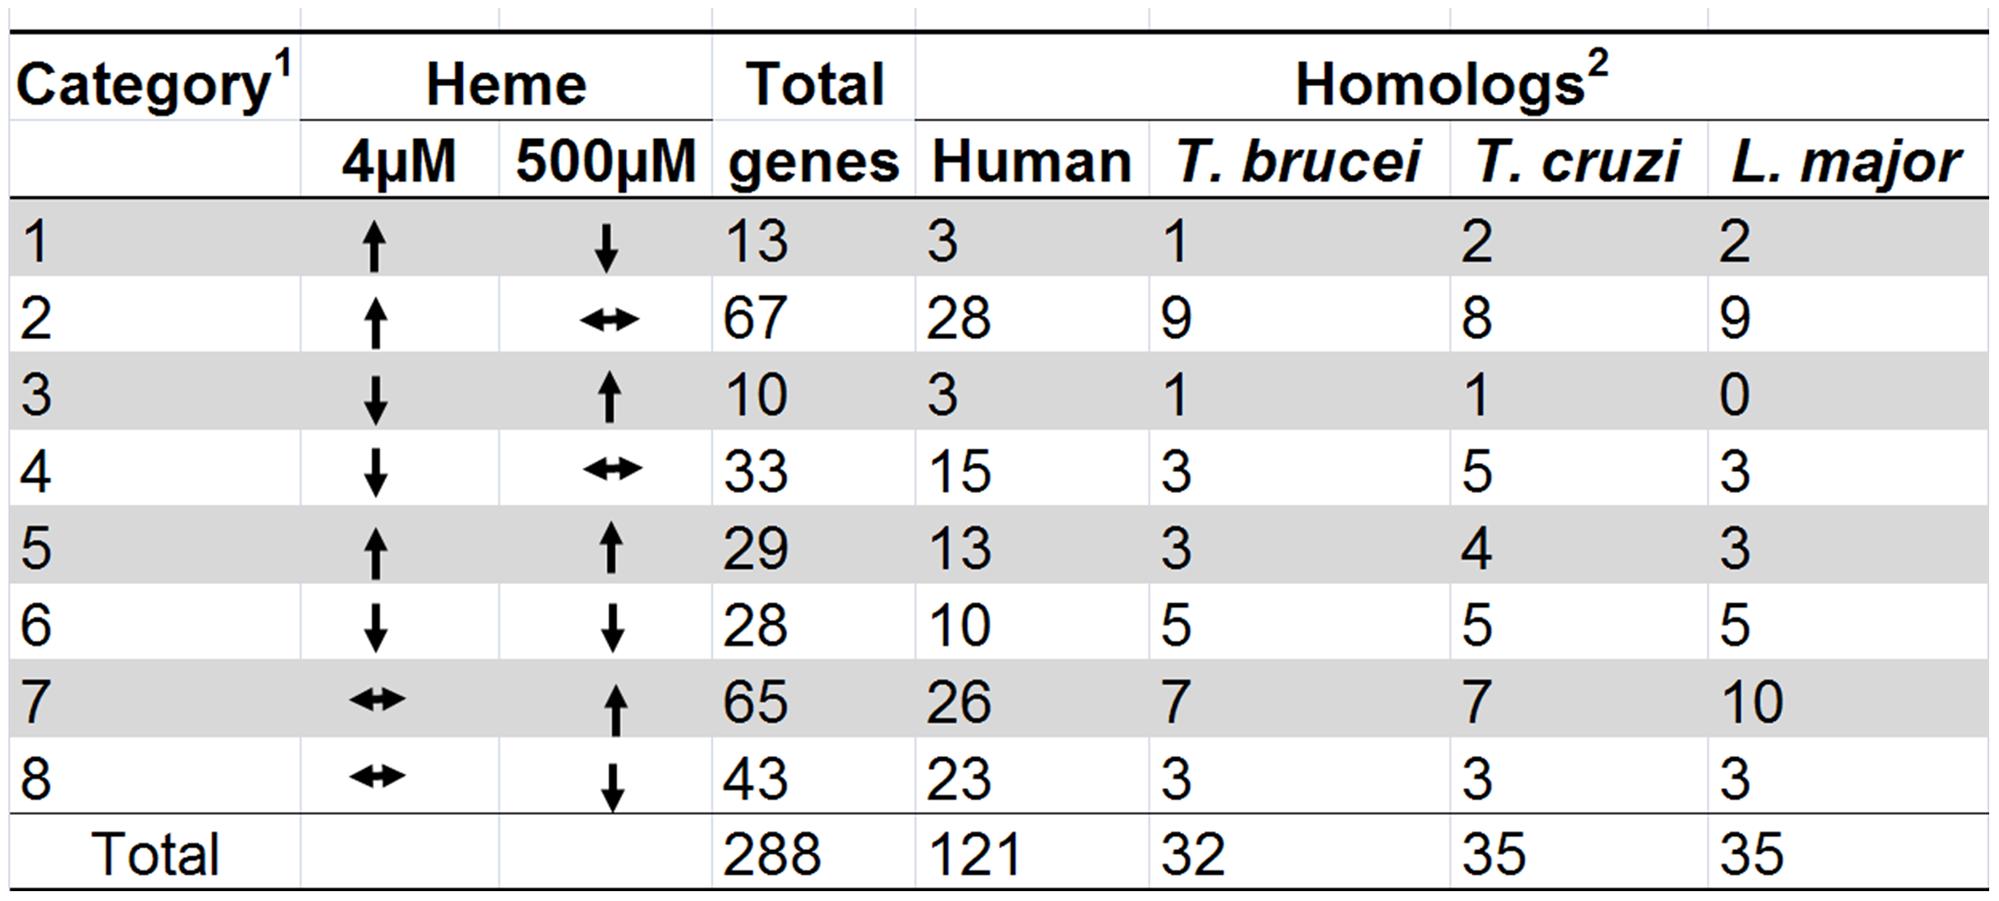 Heme-dependent changes in gene expression.